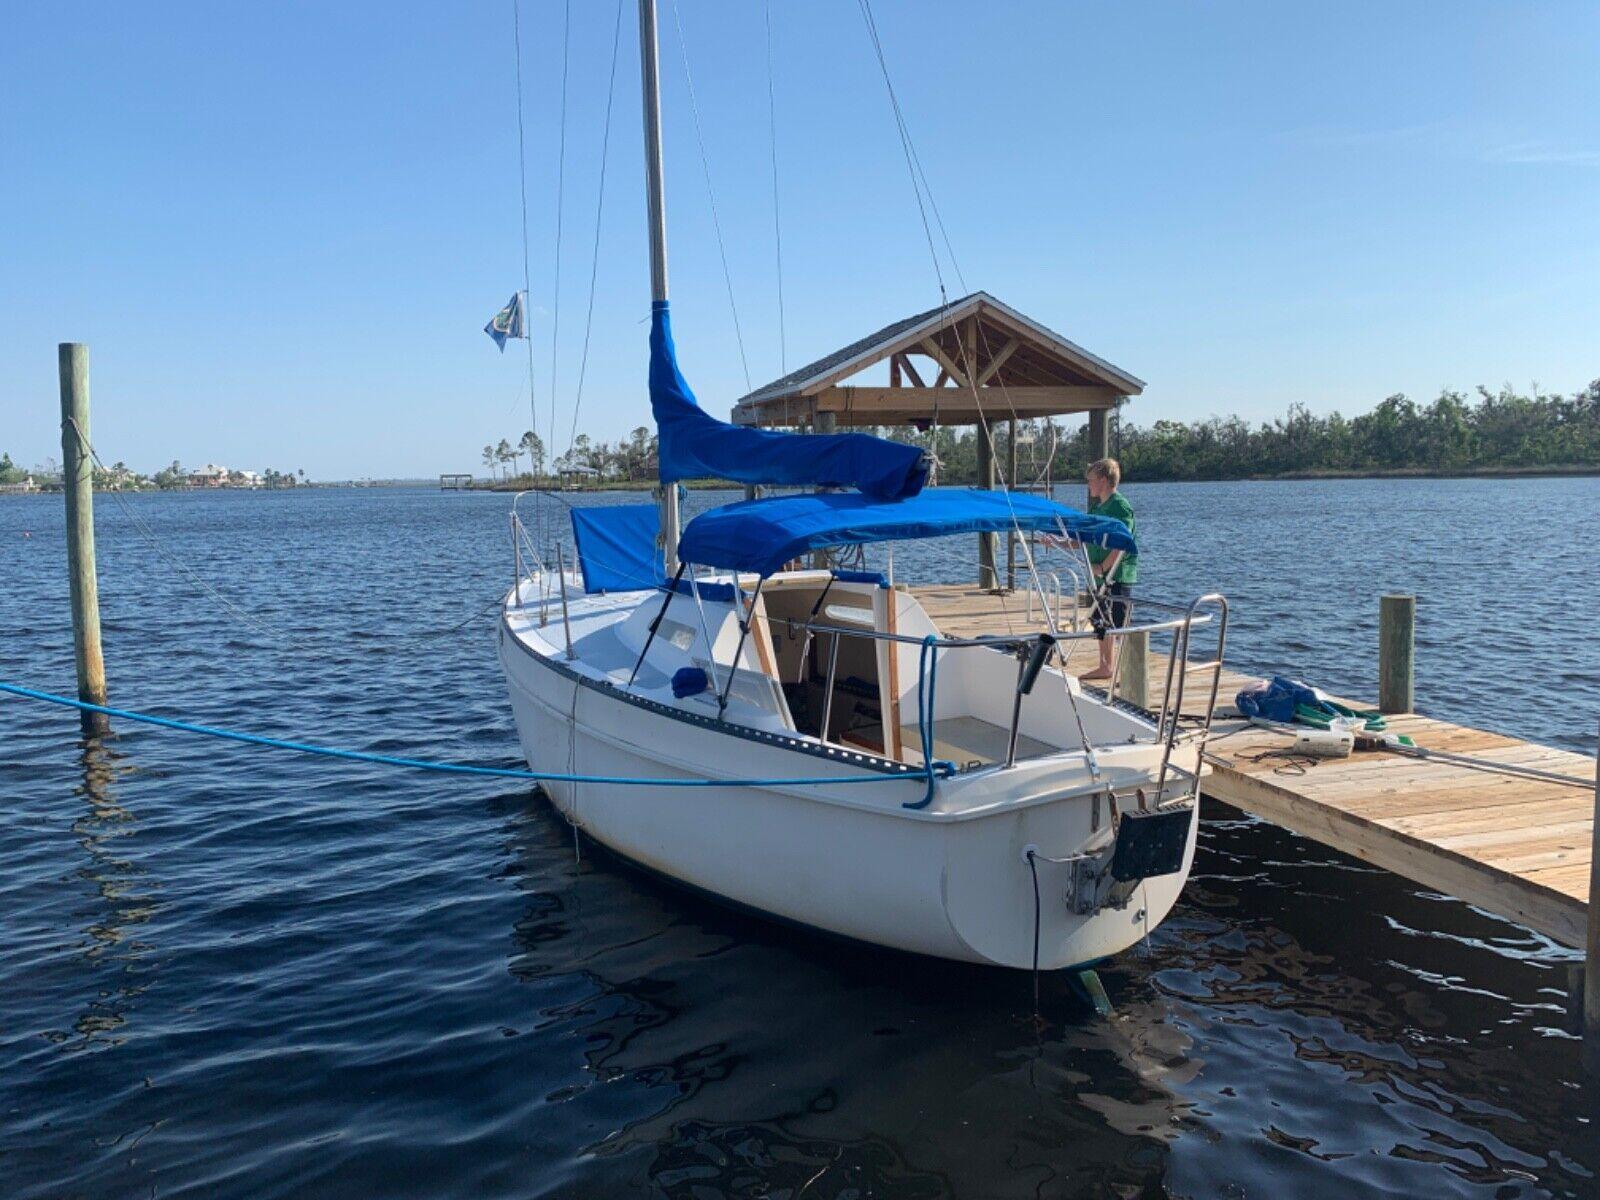 Columbia 26 1975 sailboat